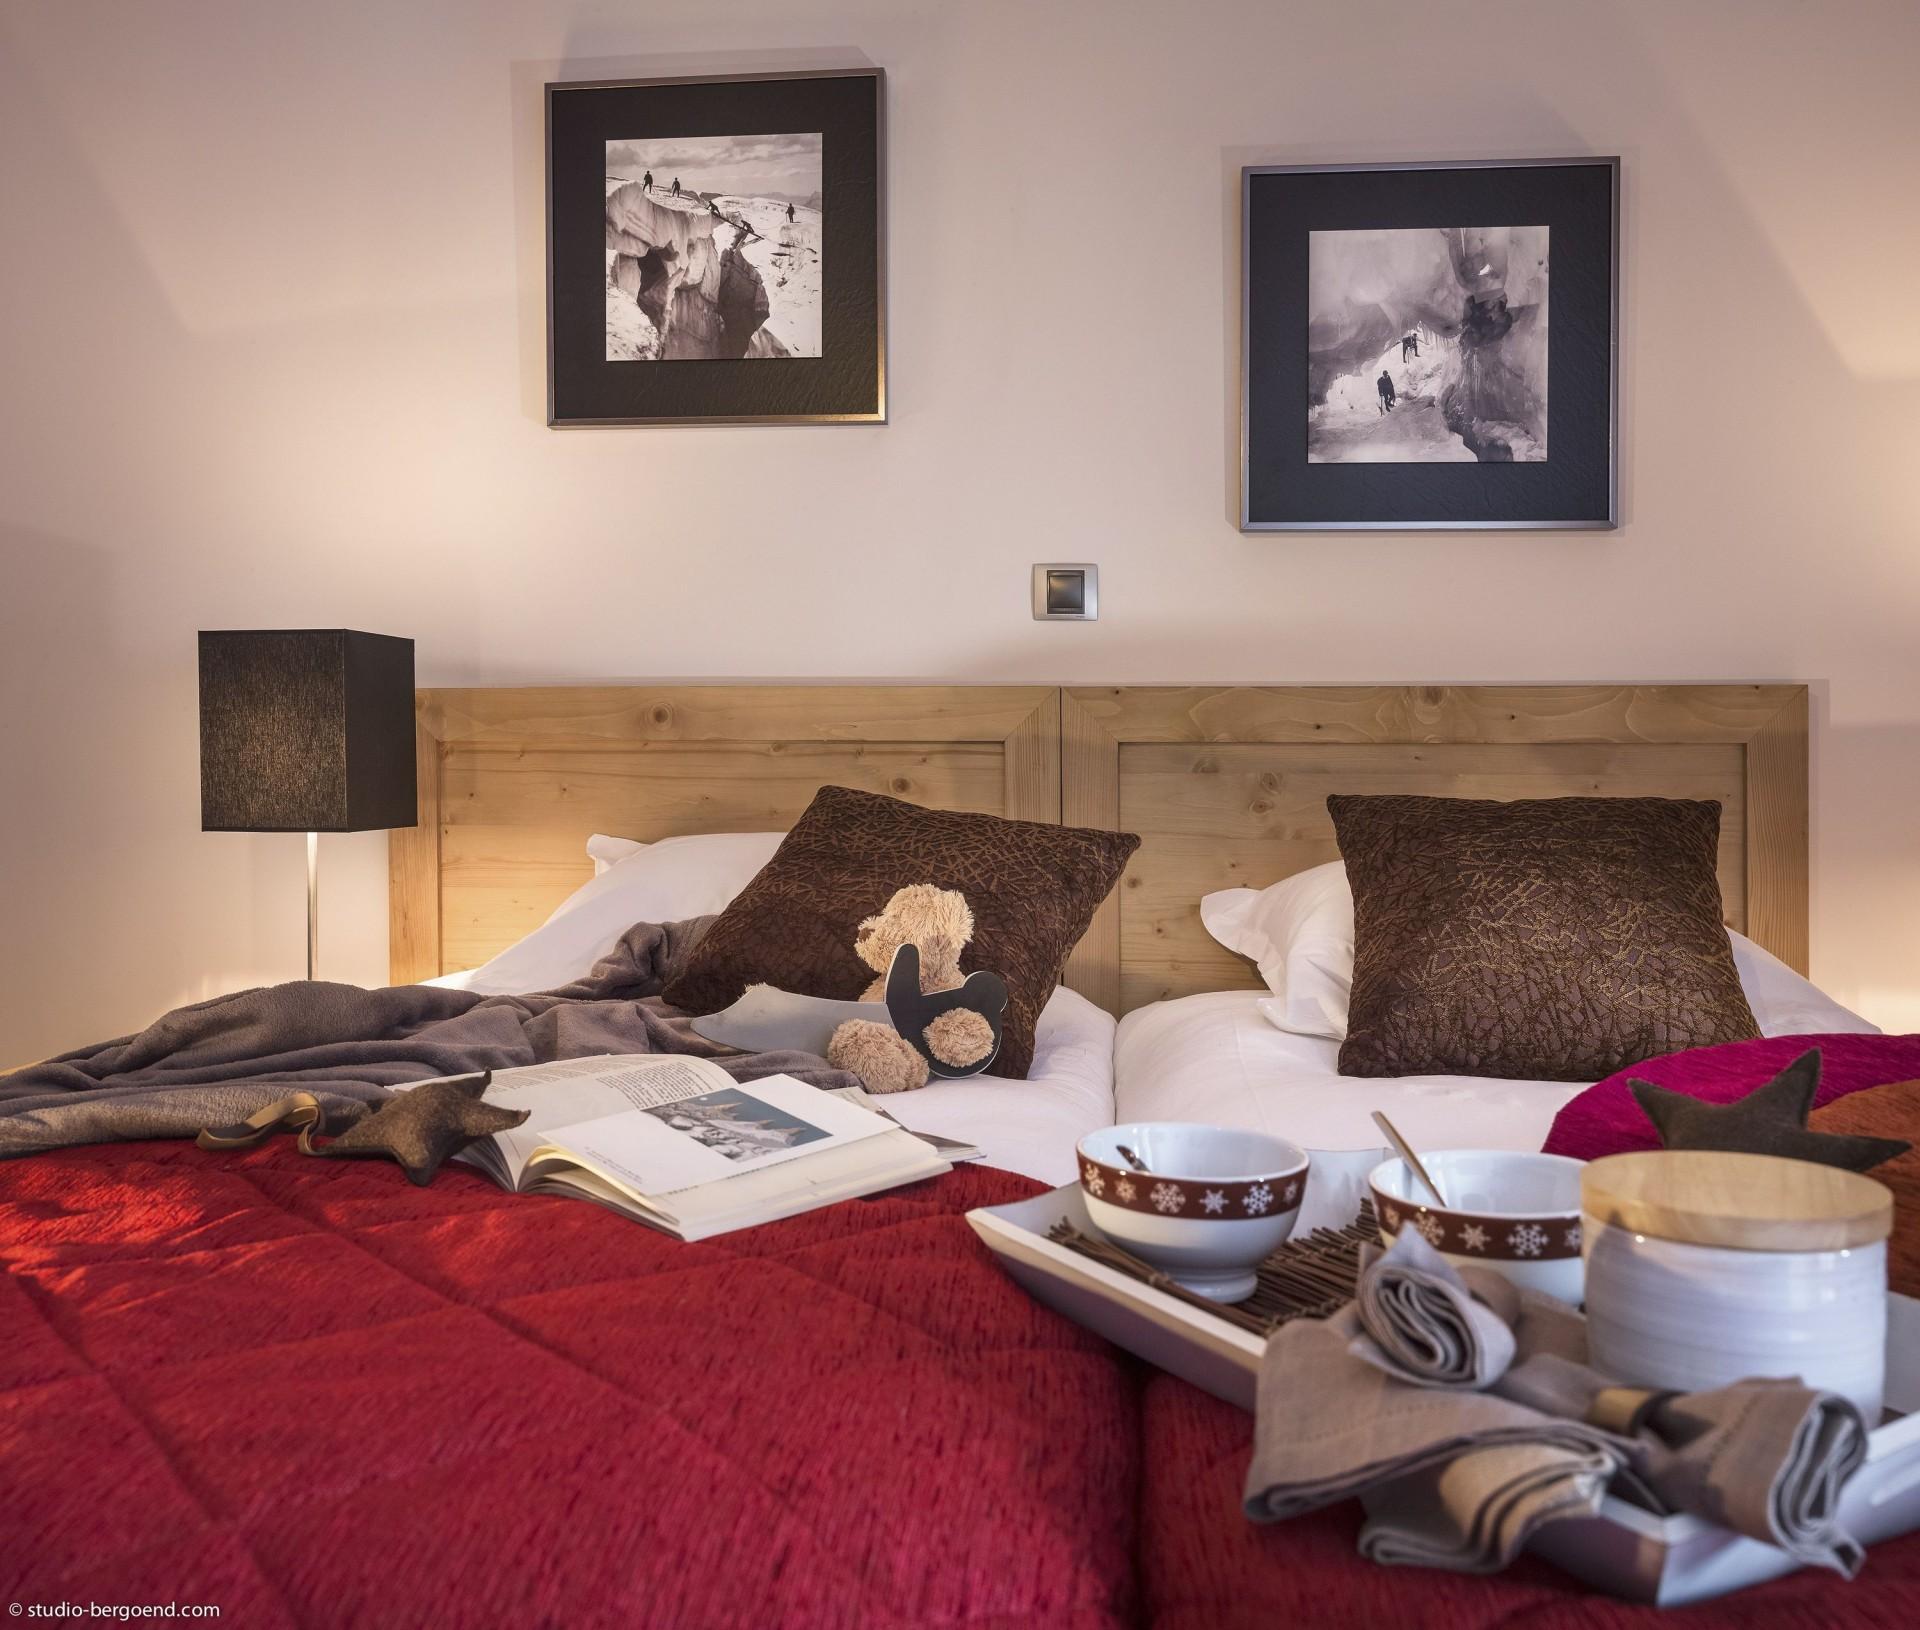 La Rosière Location Appartement Luxe Rosasite Chambre